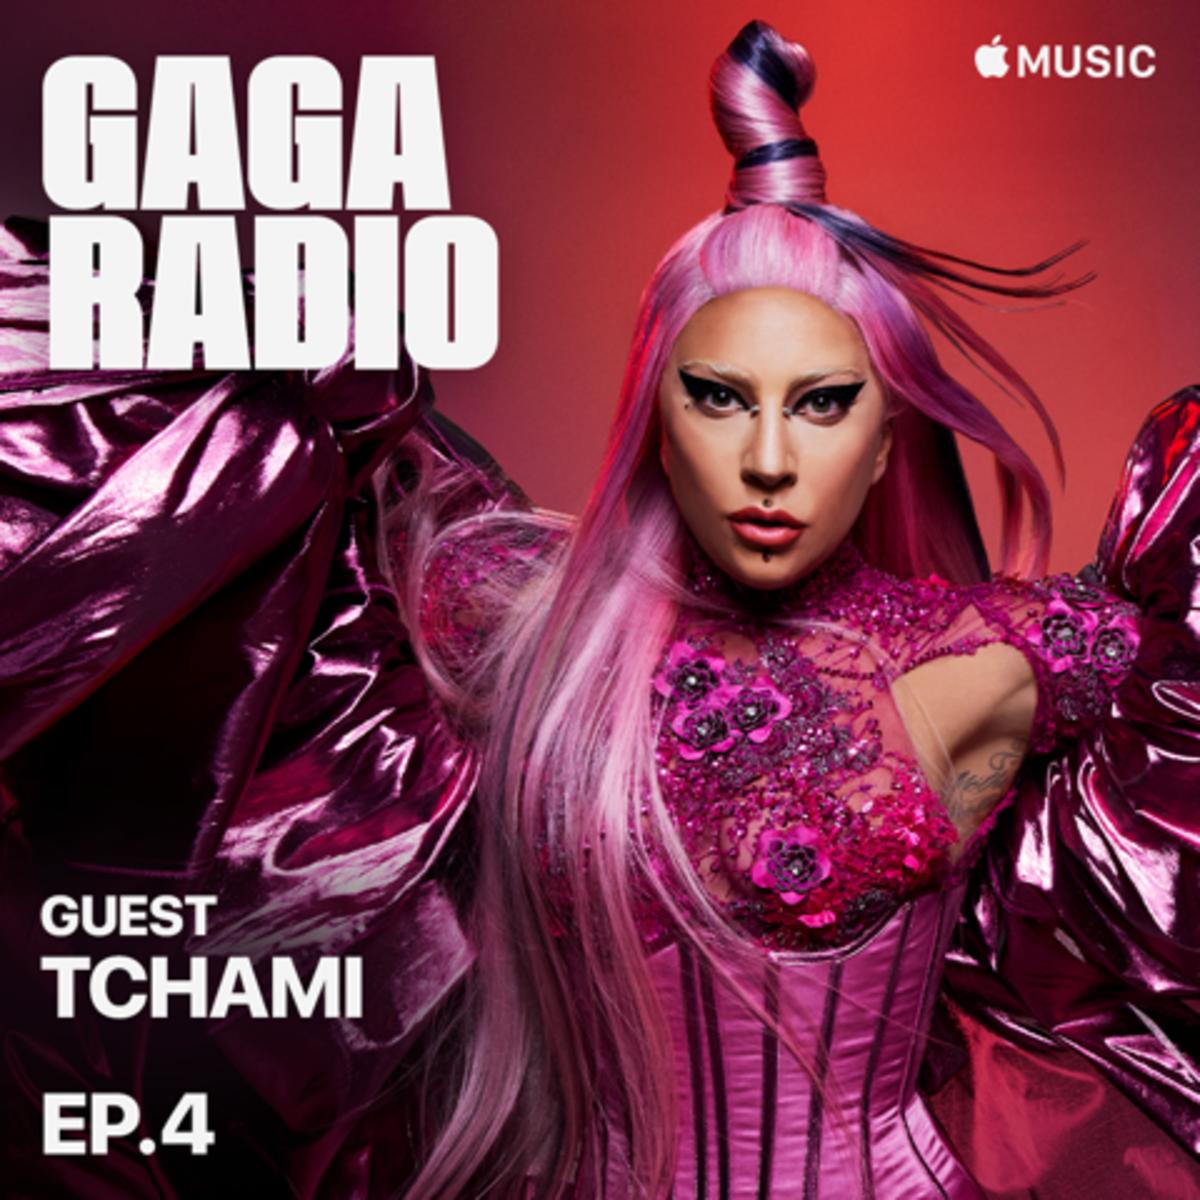 META-MS-WW-GAGA_RADIO-TCHAMI-EP4